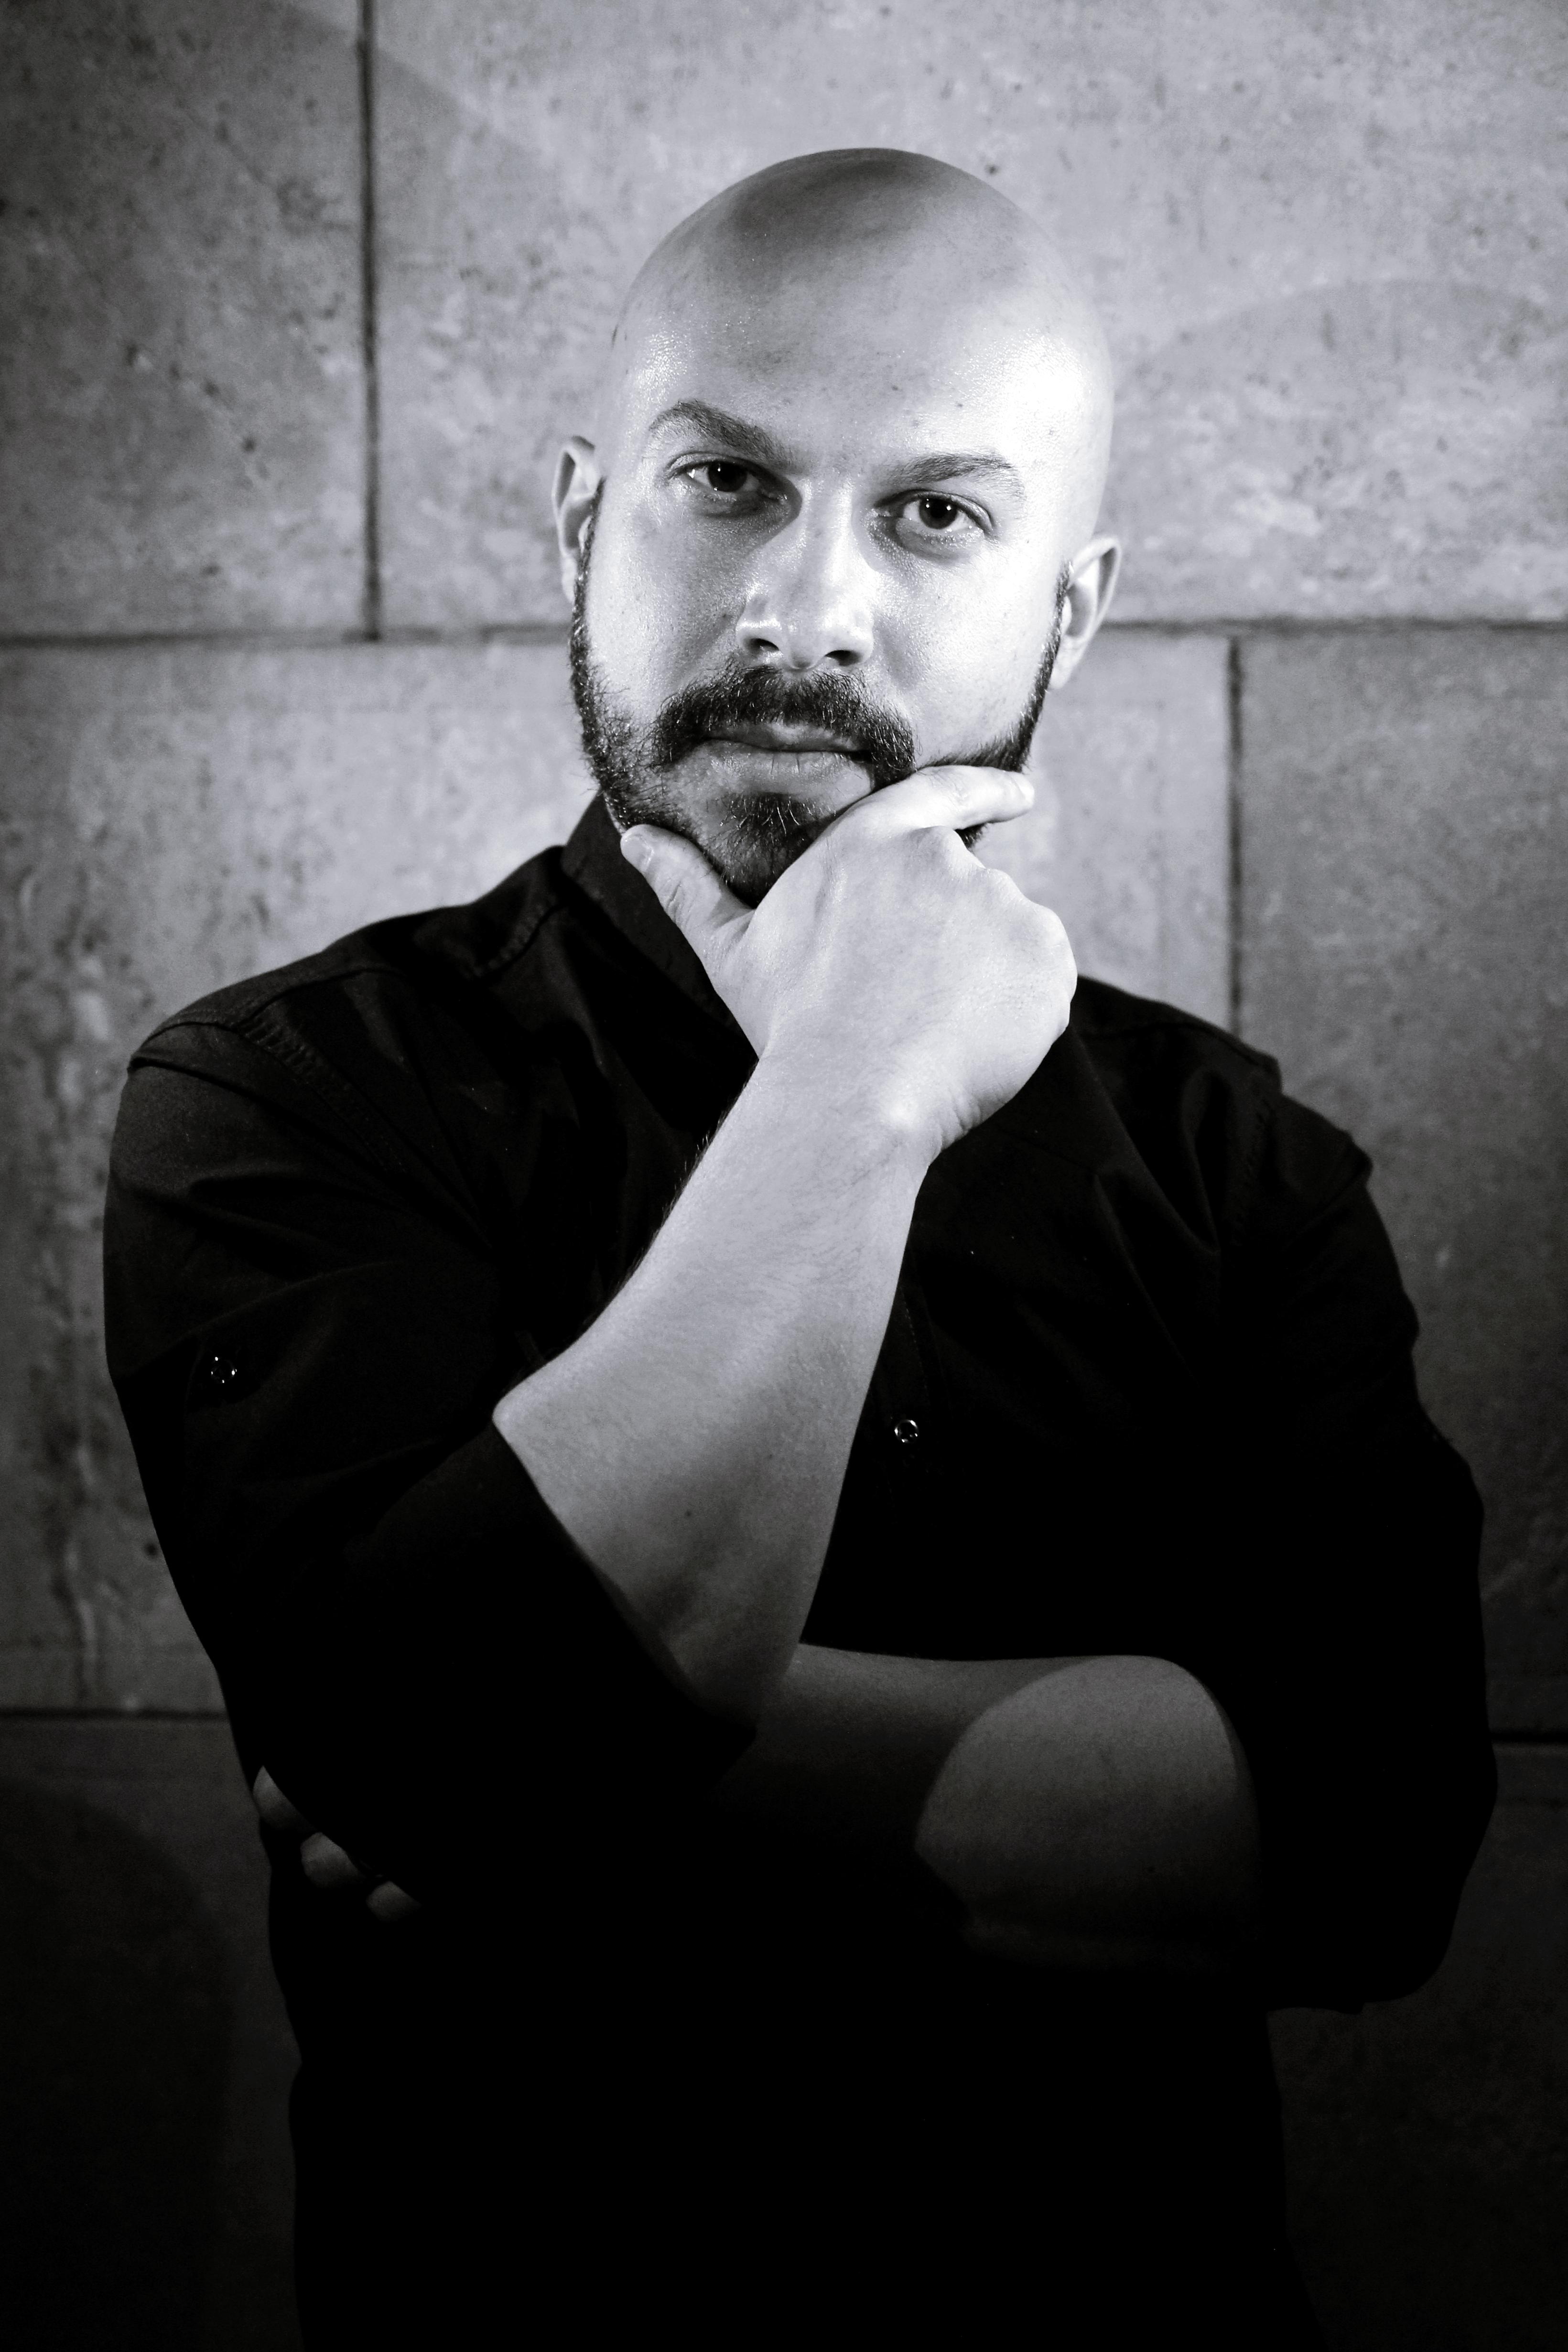 Cristi Bageac